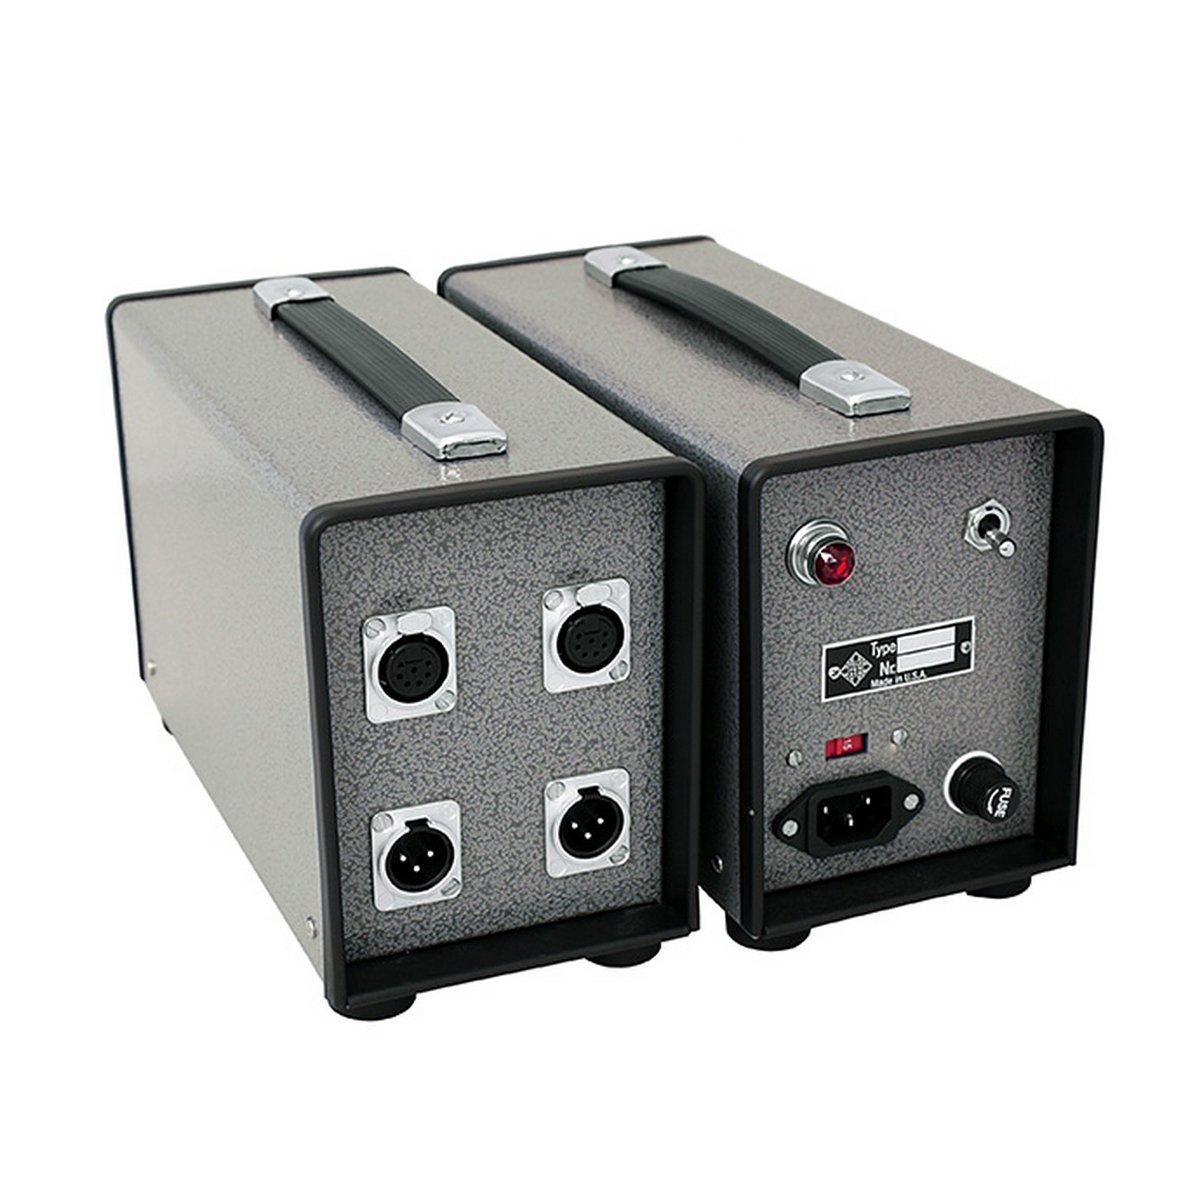 TELEFUNKEN Elektroakustik M 960S | Dual Power Supply for Two ELA M 260 / CU-29